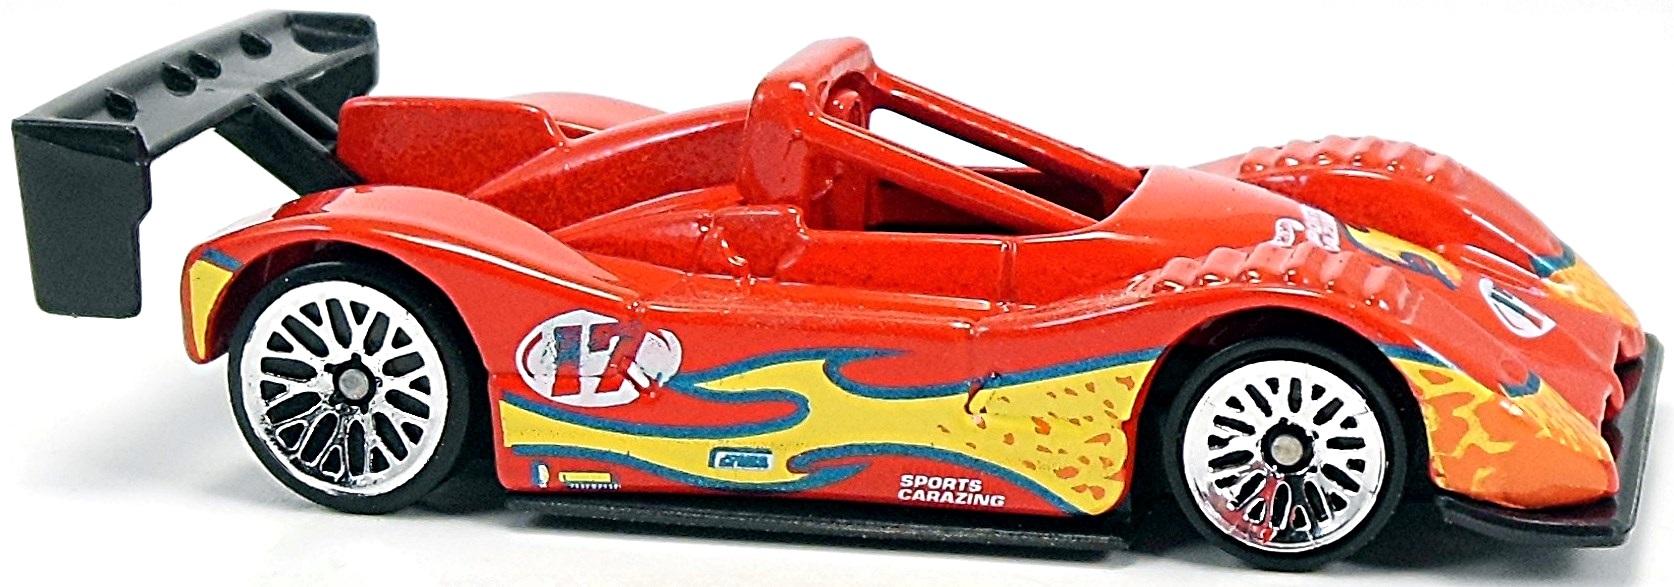 Ferrari 333 Sp 72mm 2000 Hot Wheels Newsletter